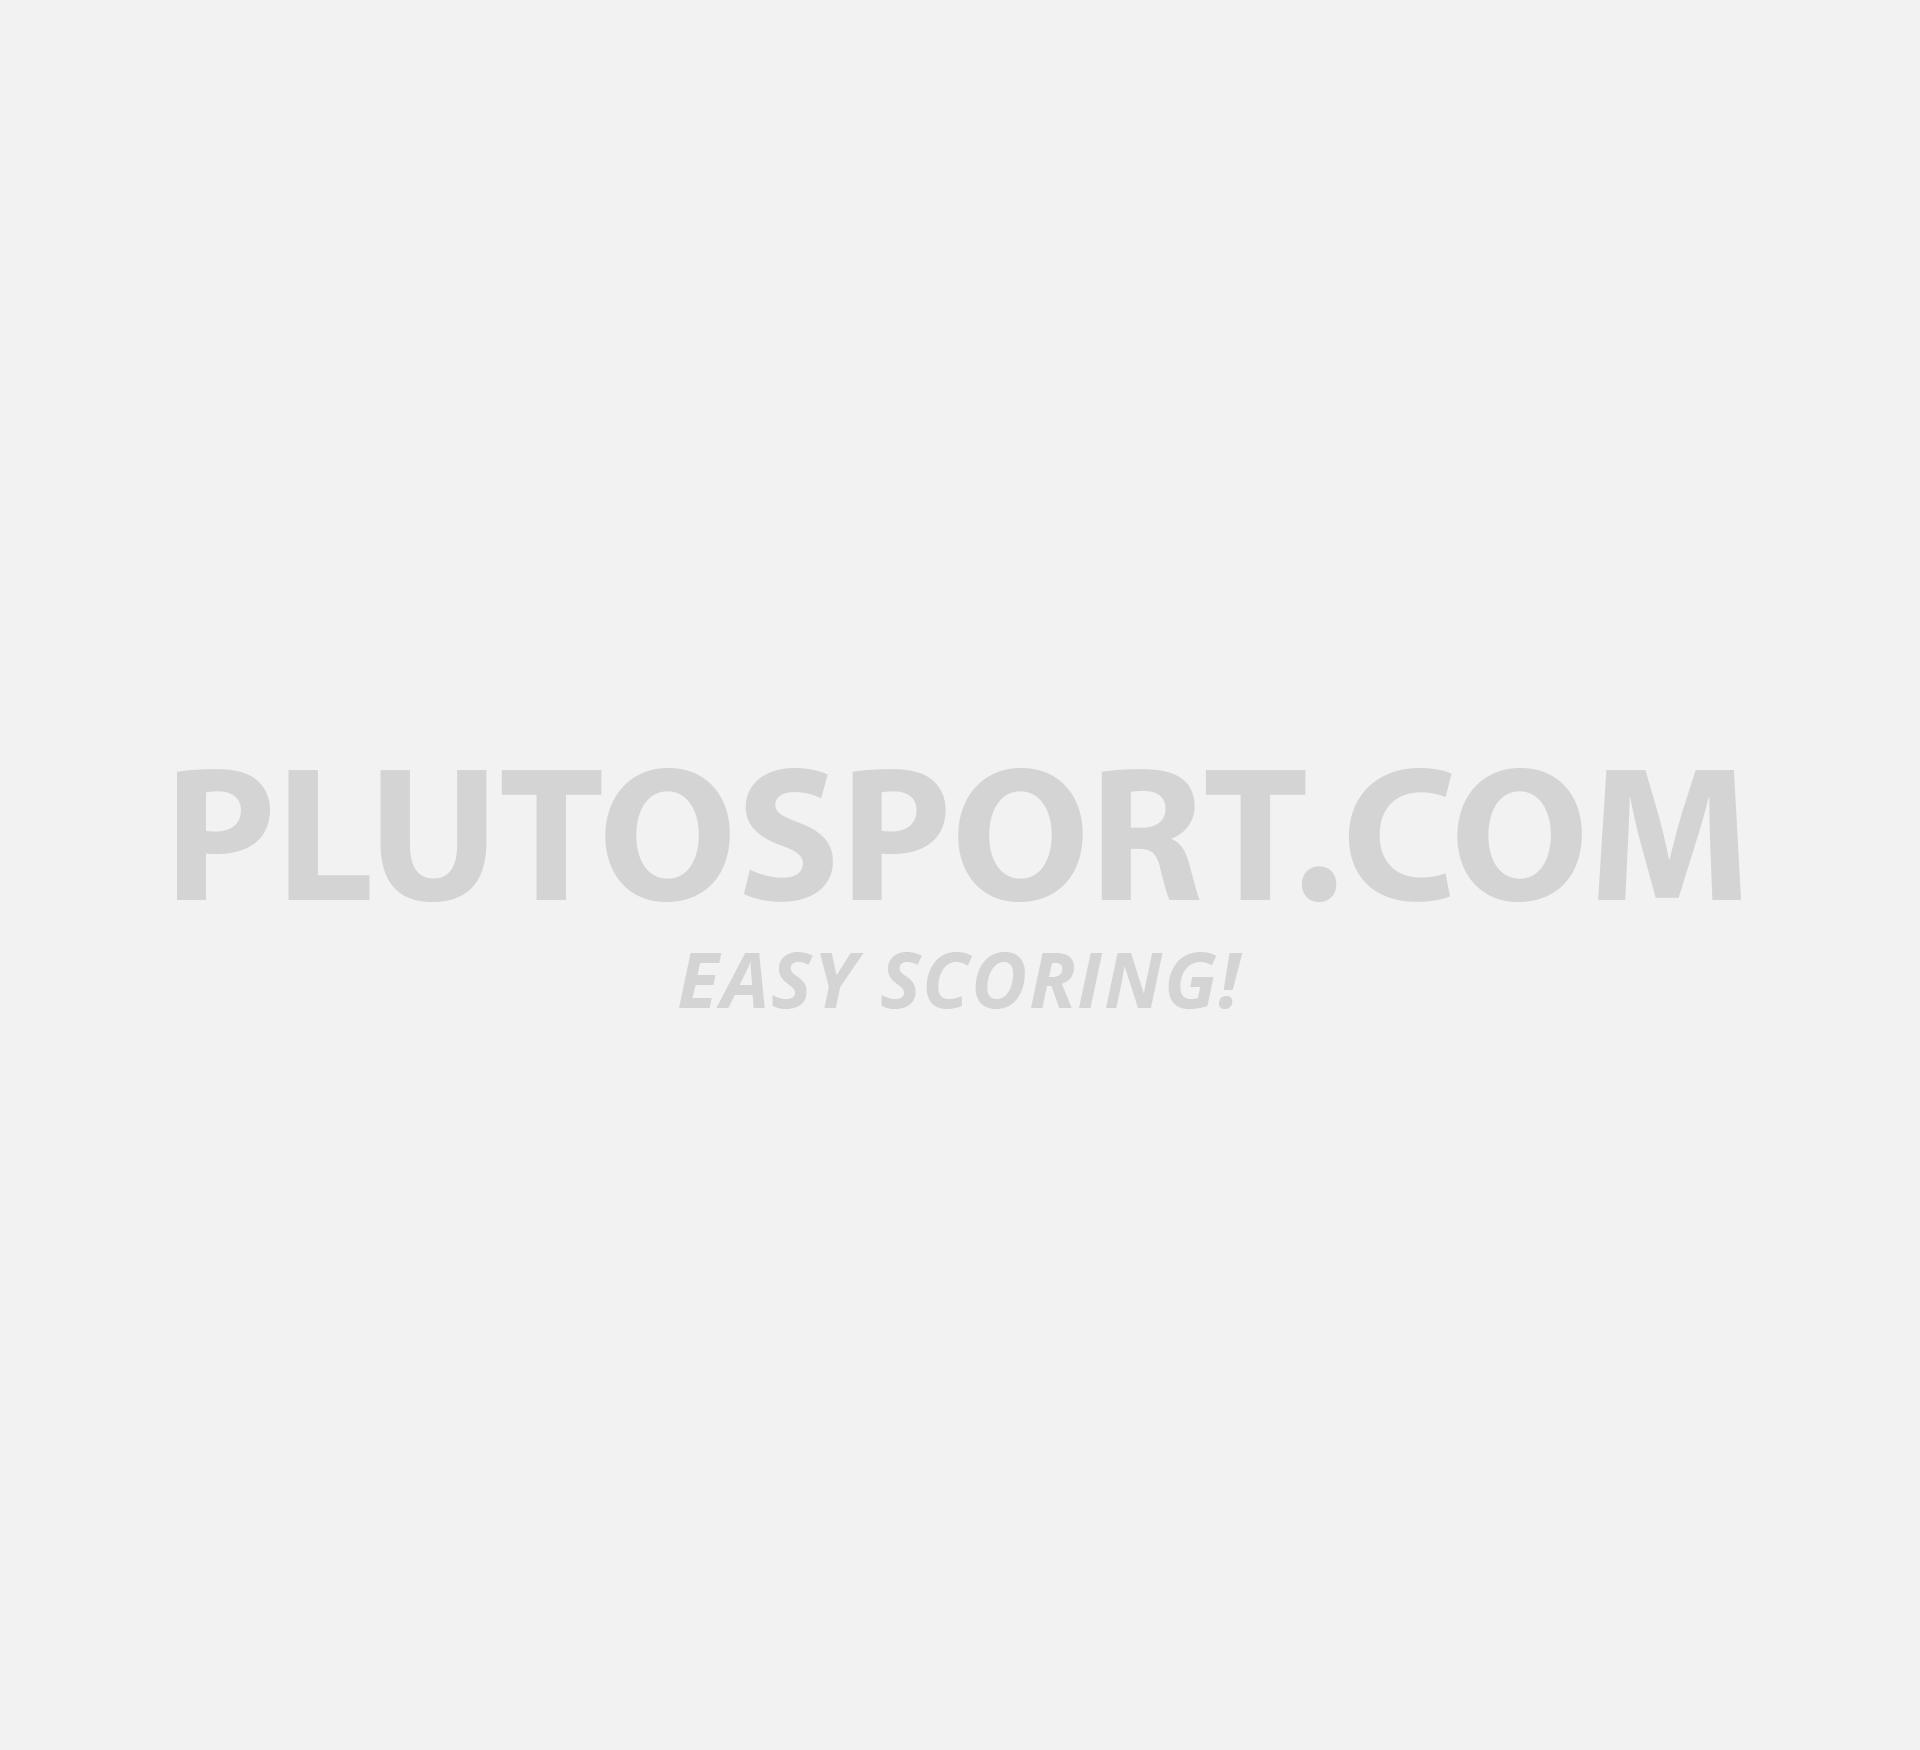 416fabf606 Roxy Billie Snowboard Jacket - Winter jackets - Jackets - Clothing -  Lifestyle - Sports | Plutosport